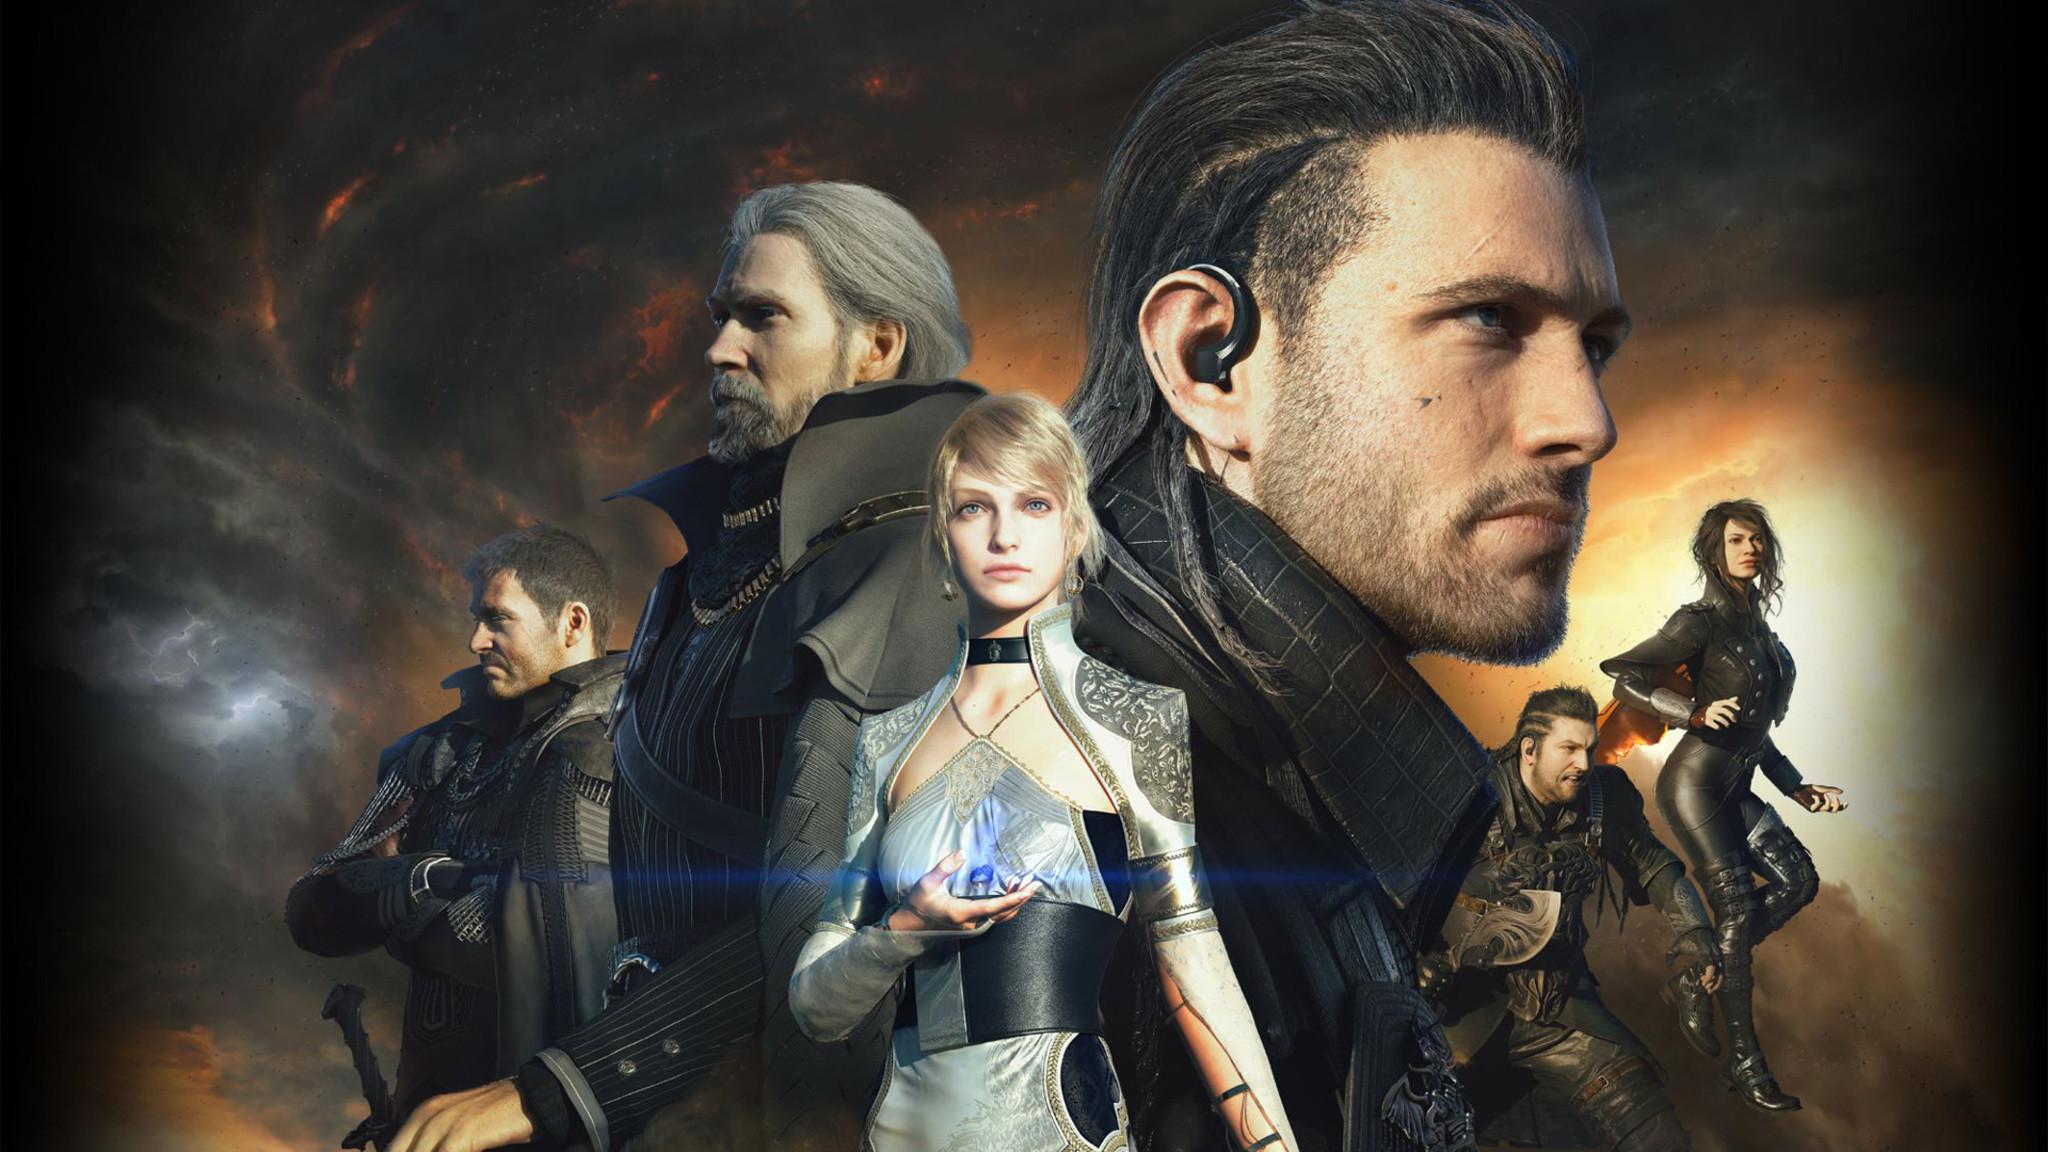 Download Kingsglaive Final Fantasy XV HD Wallpaper In Screen  Resolution